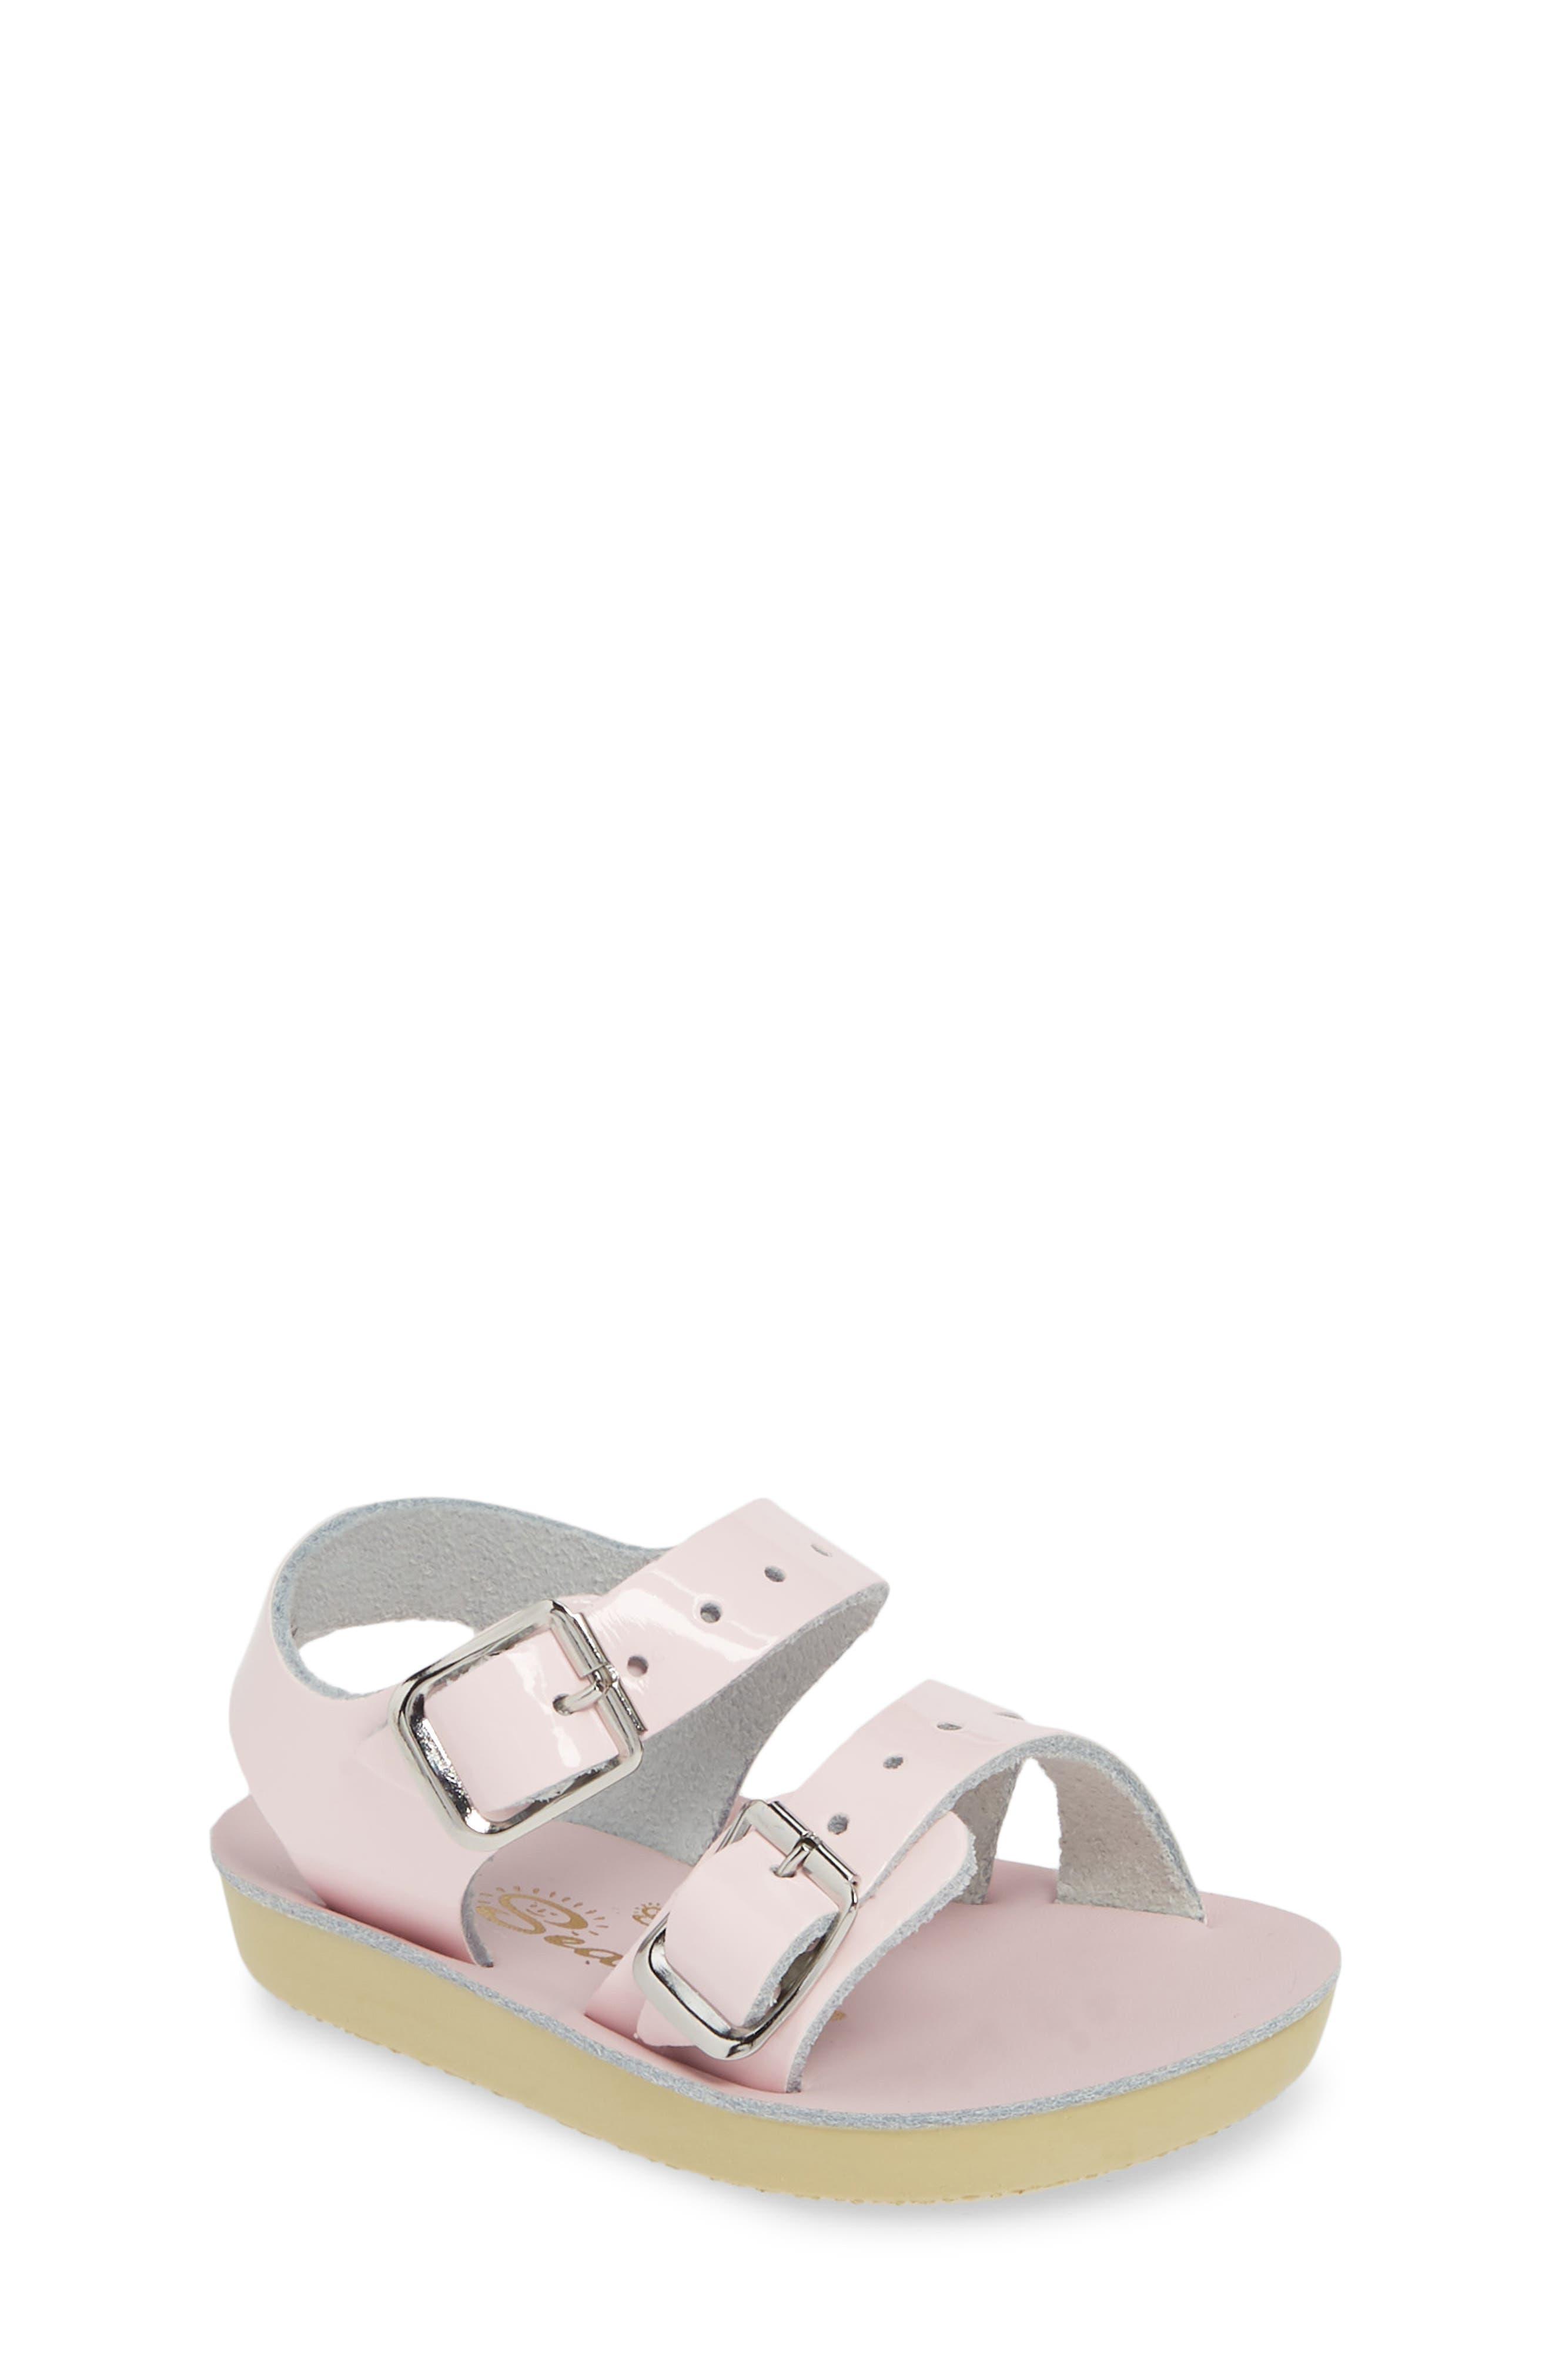 ac3d6c2ceb89 Boys  Water Shoes Shoes